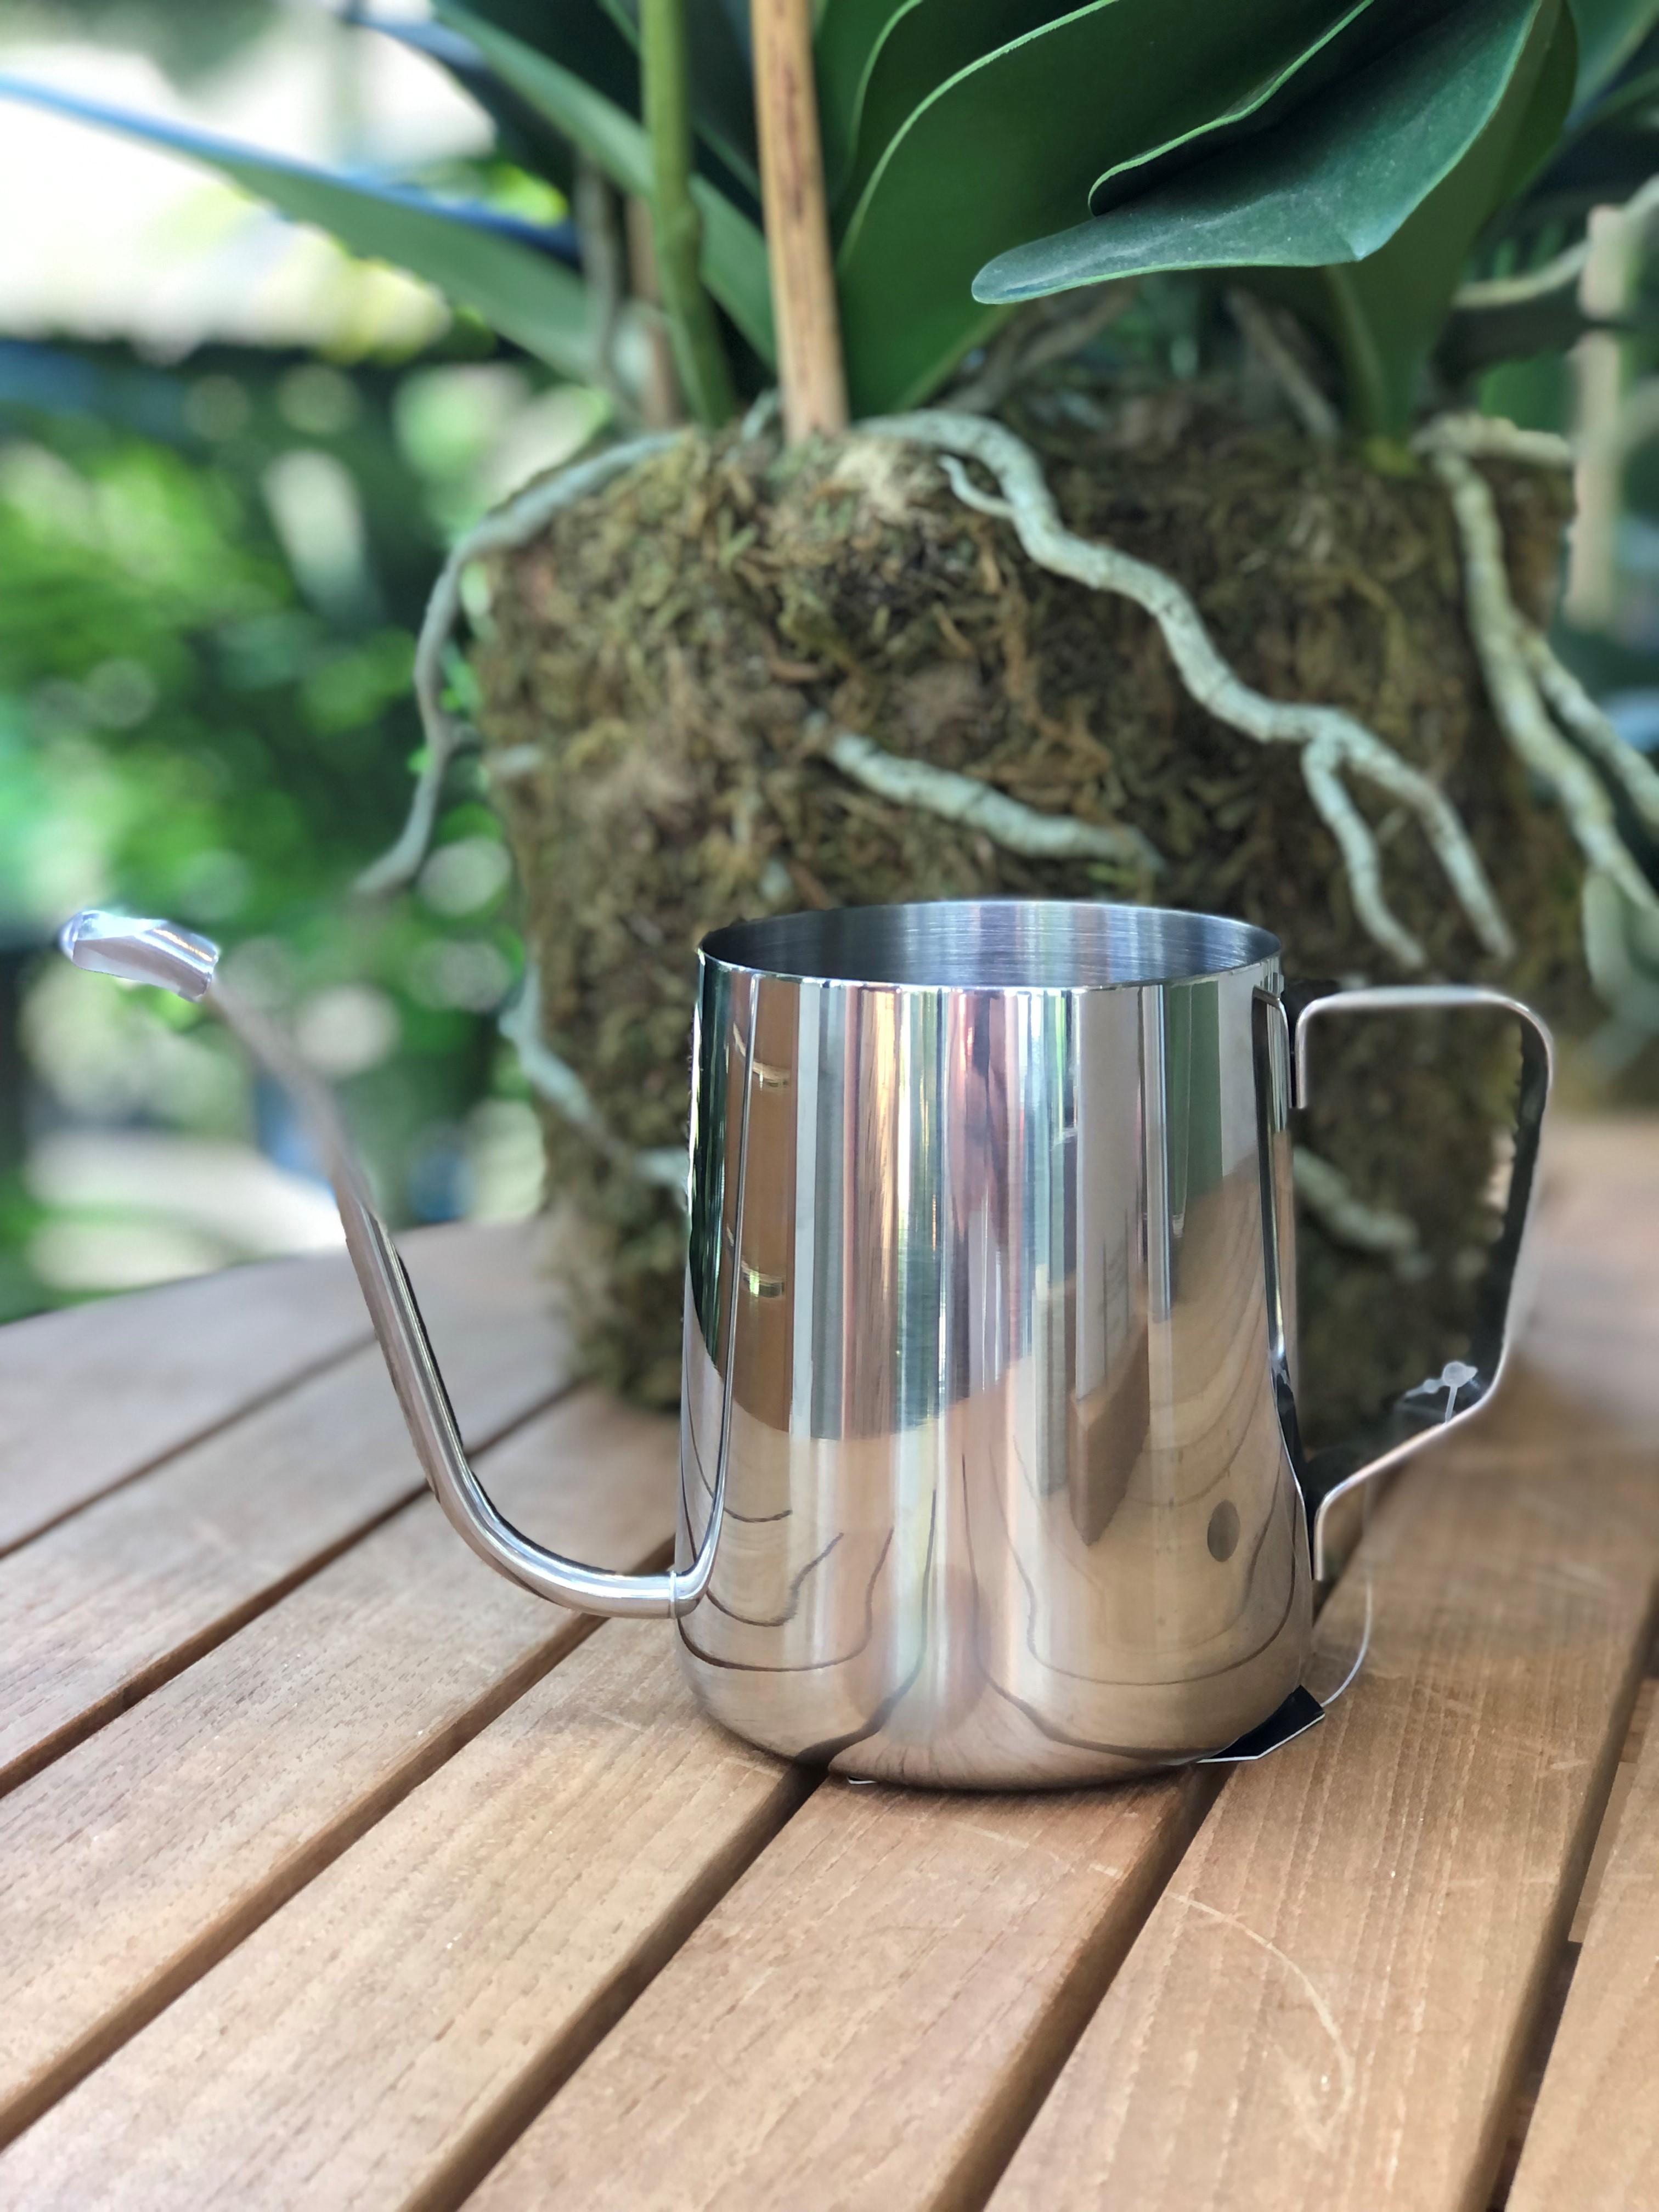 Stainless Steel Indoor Watering Can